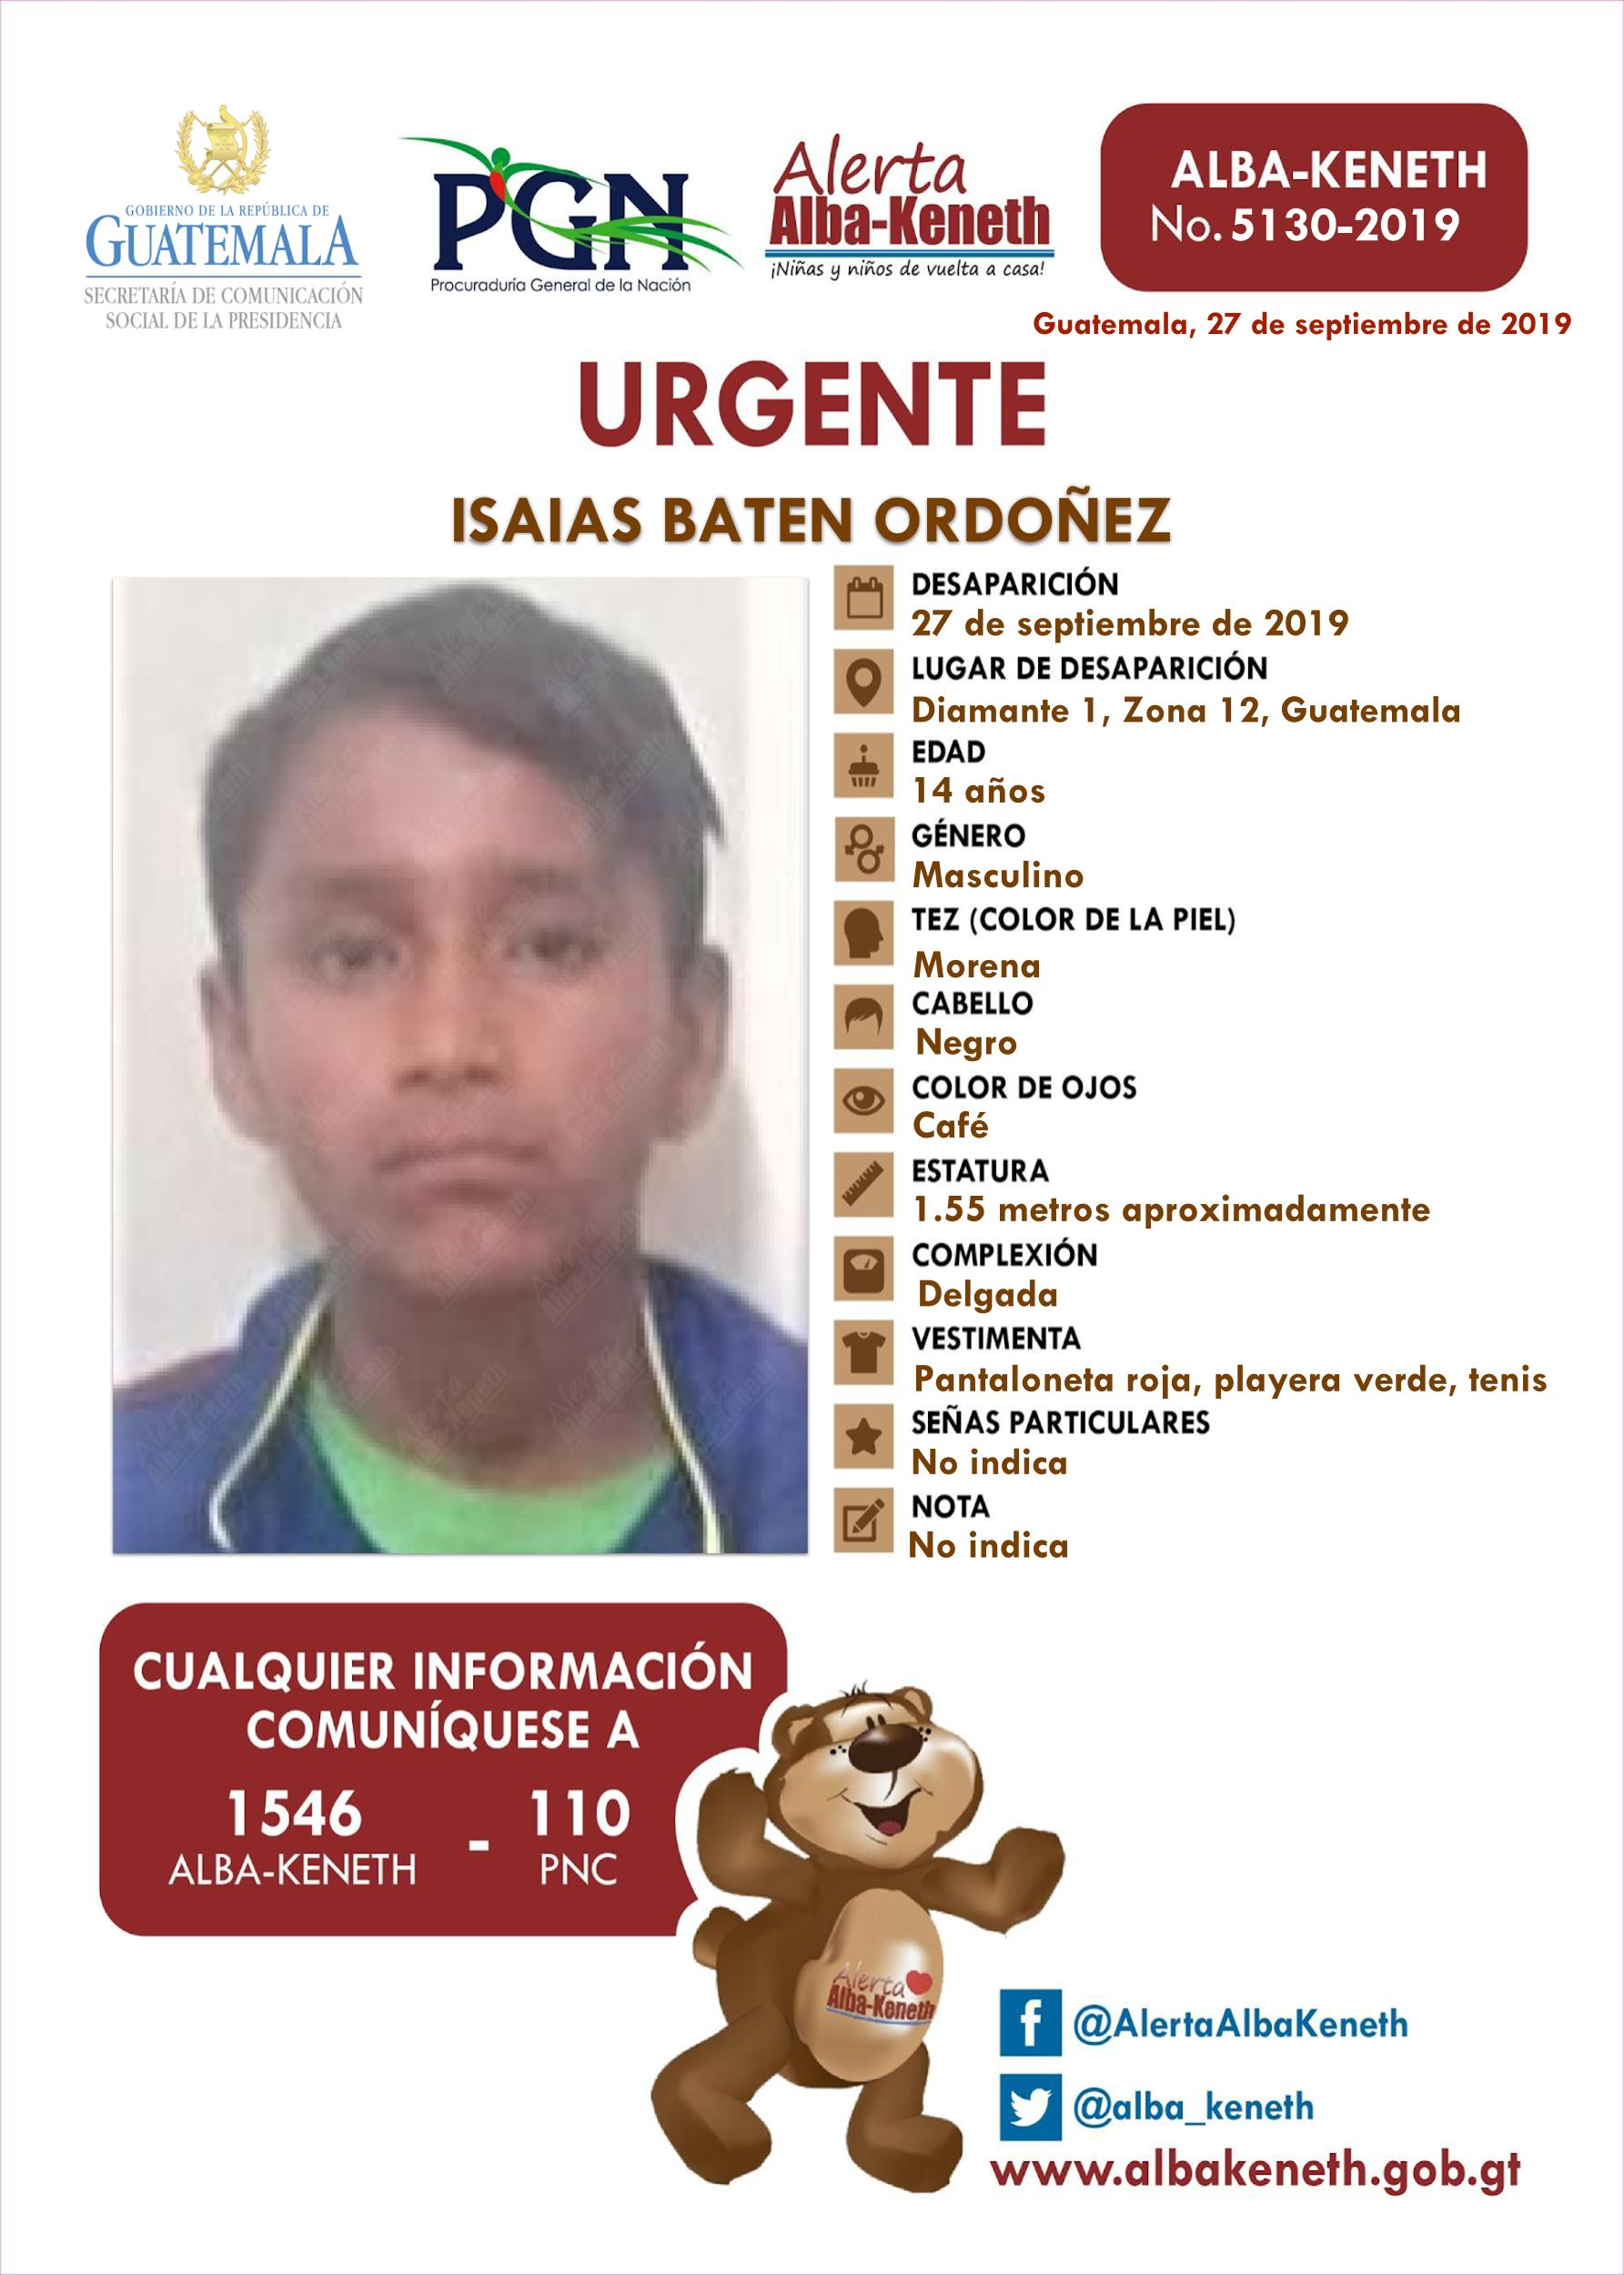 Isaias Baten Ordoñez